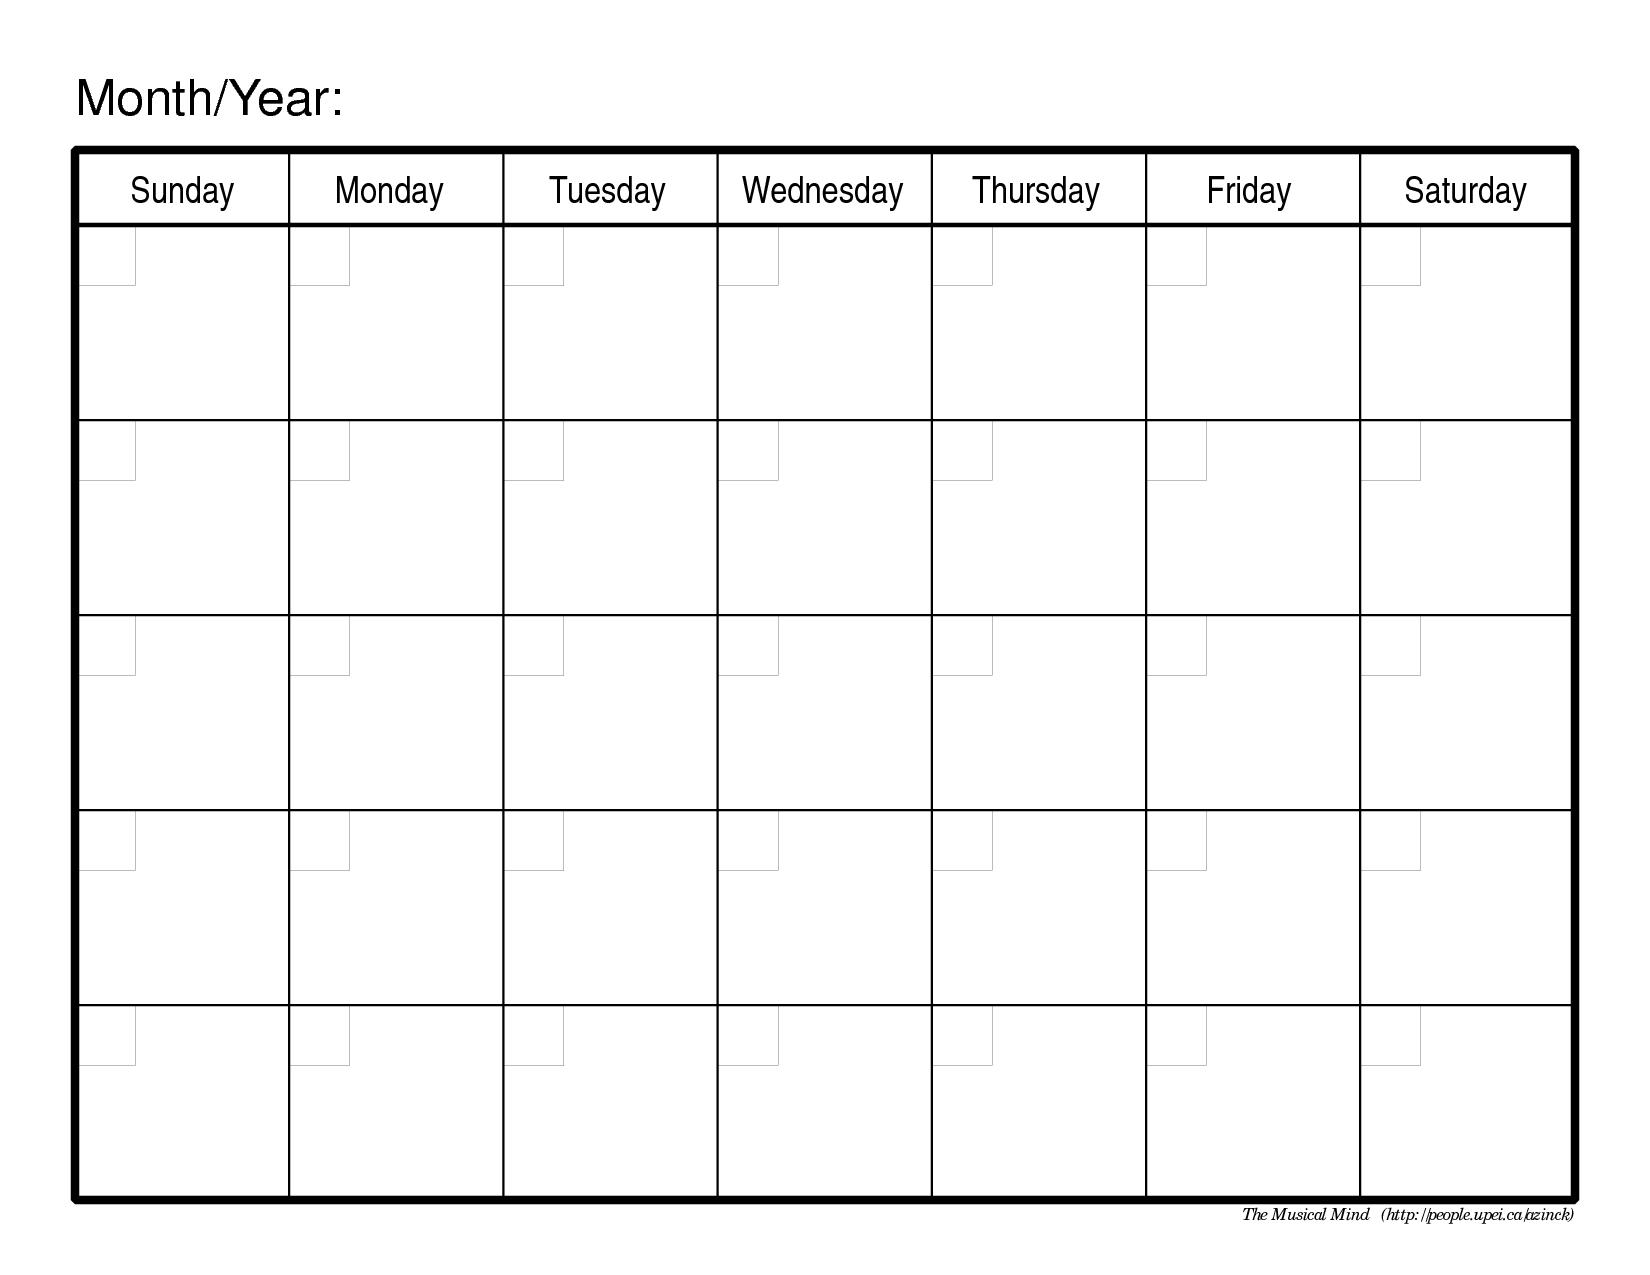 Monthly Calendar Template | Blank Monthly Calendar Template